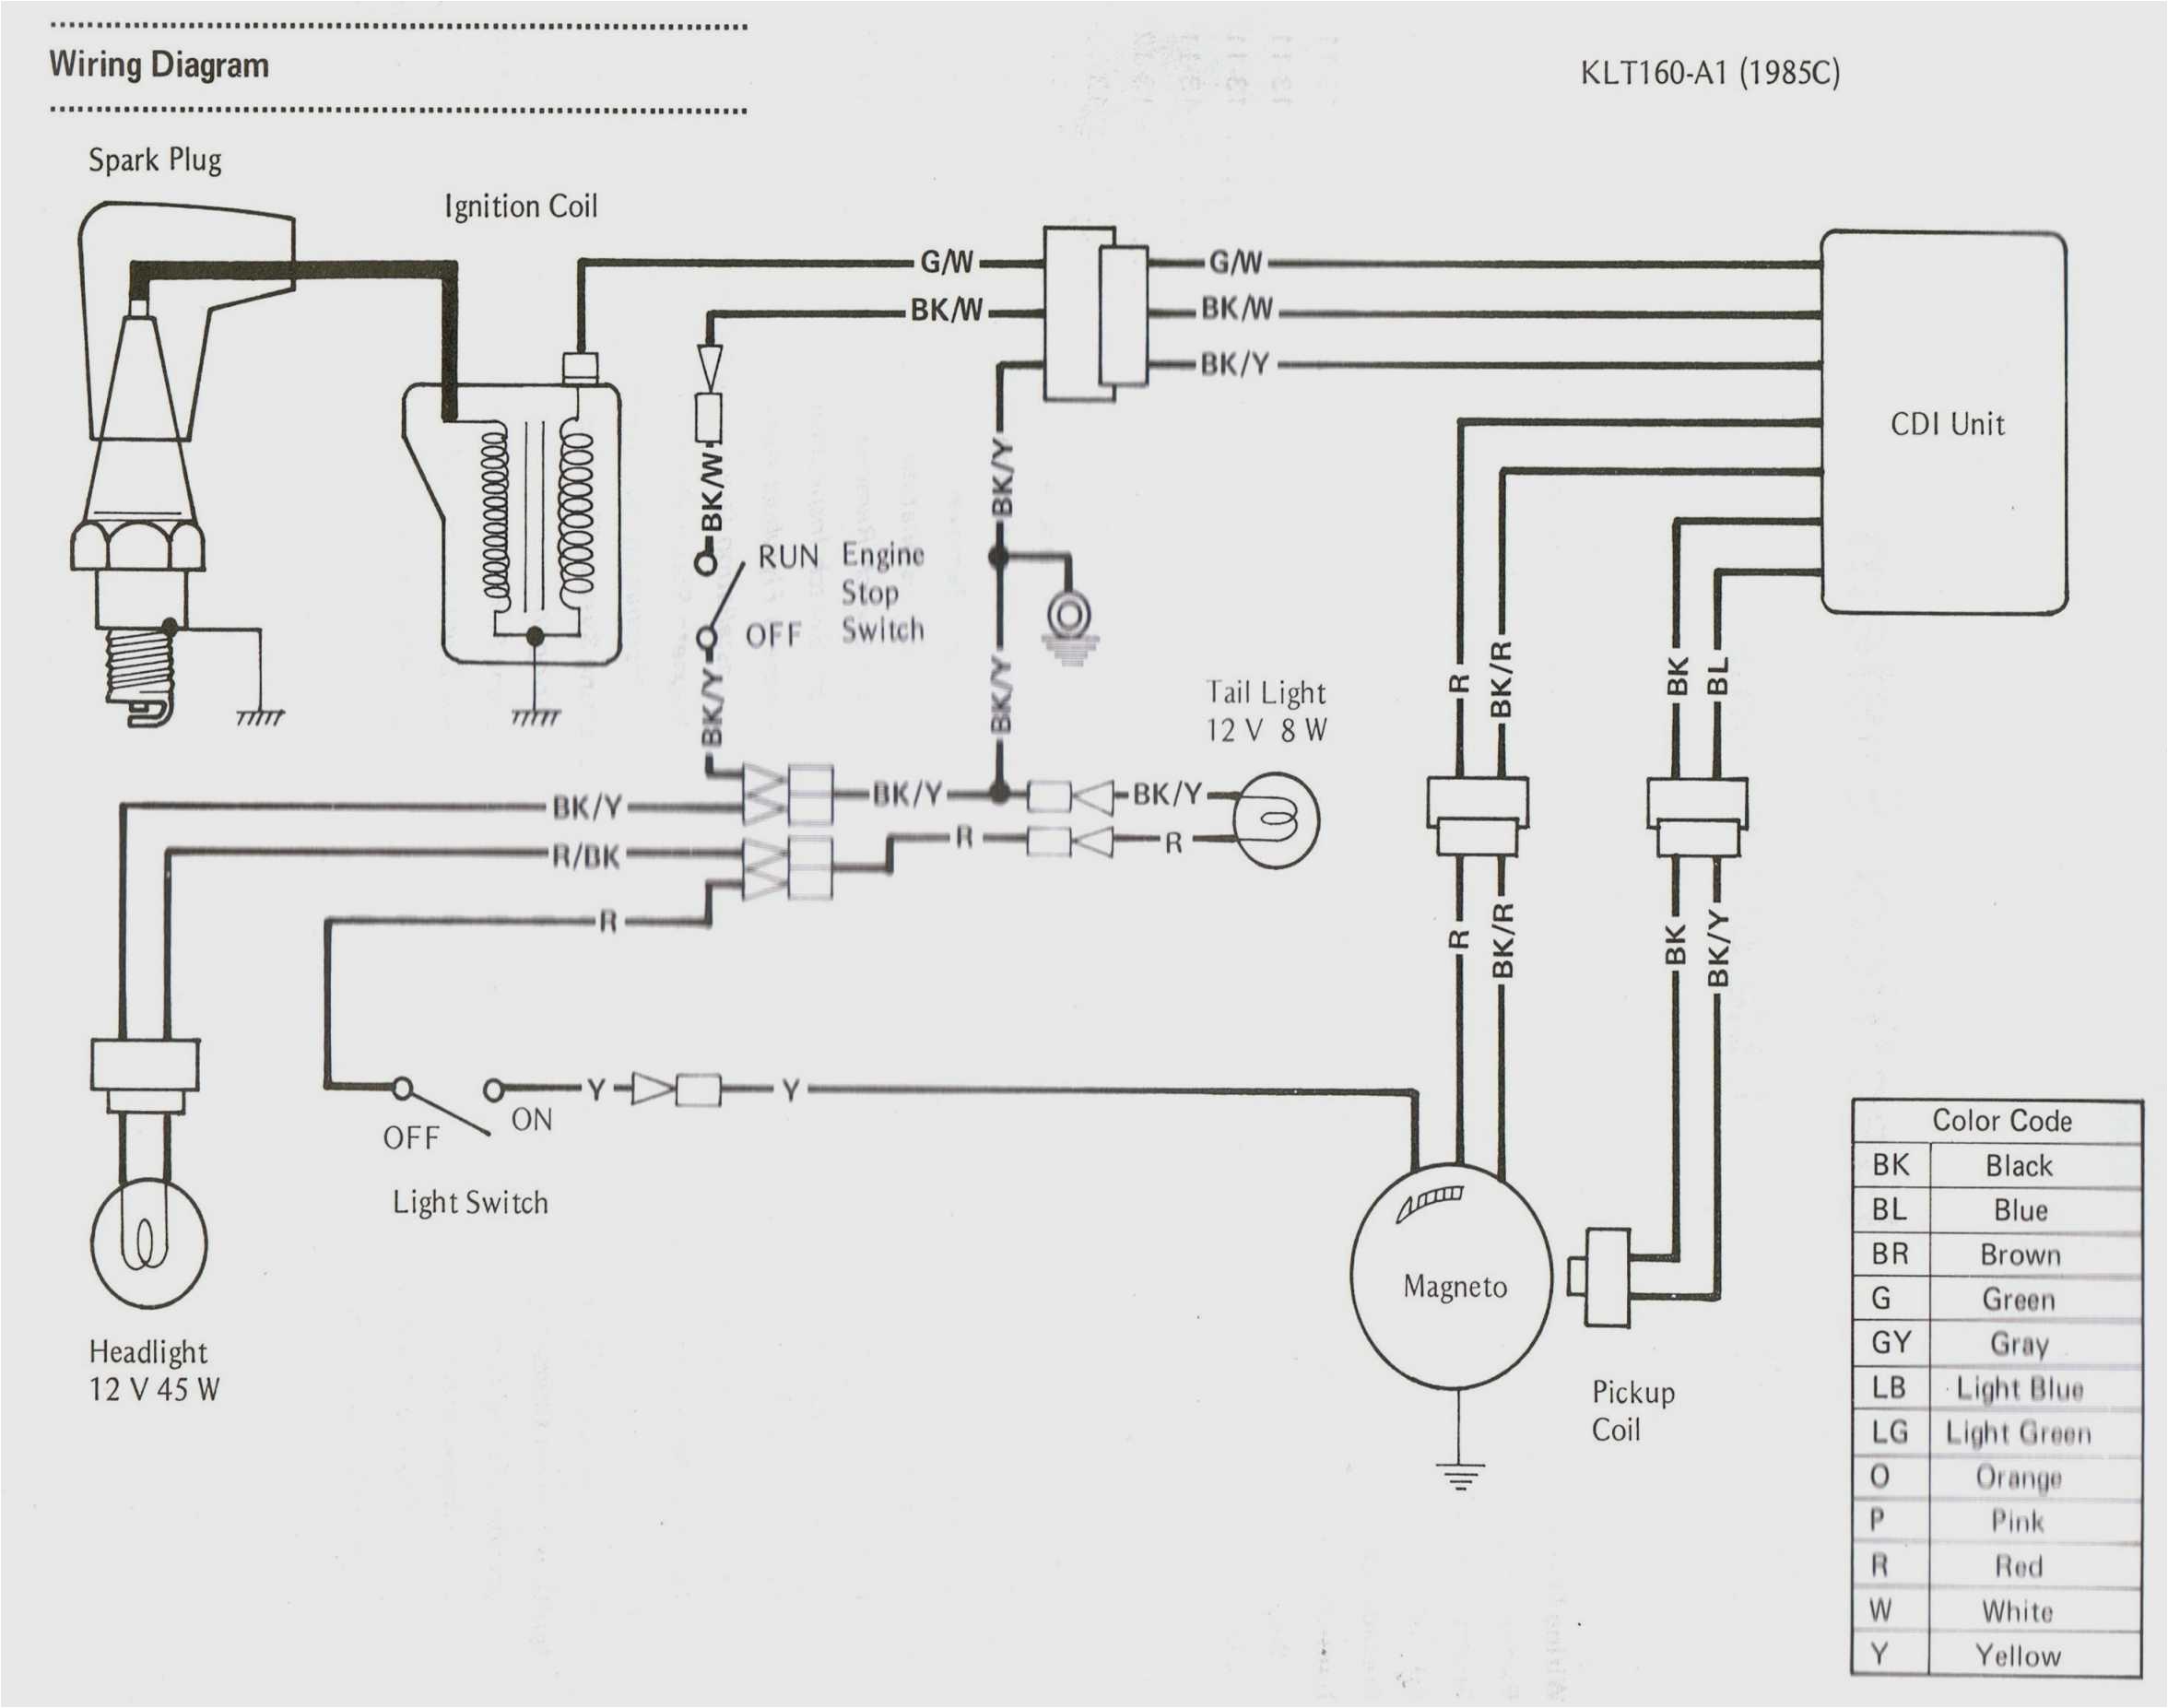 kawasaki bayou 250 three wheeler wiring diagram data wiring diagrams u2022 rh mikeadkinsguitar